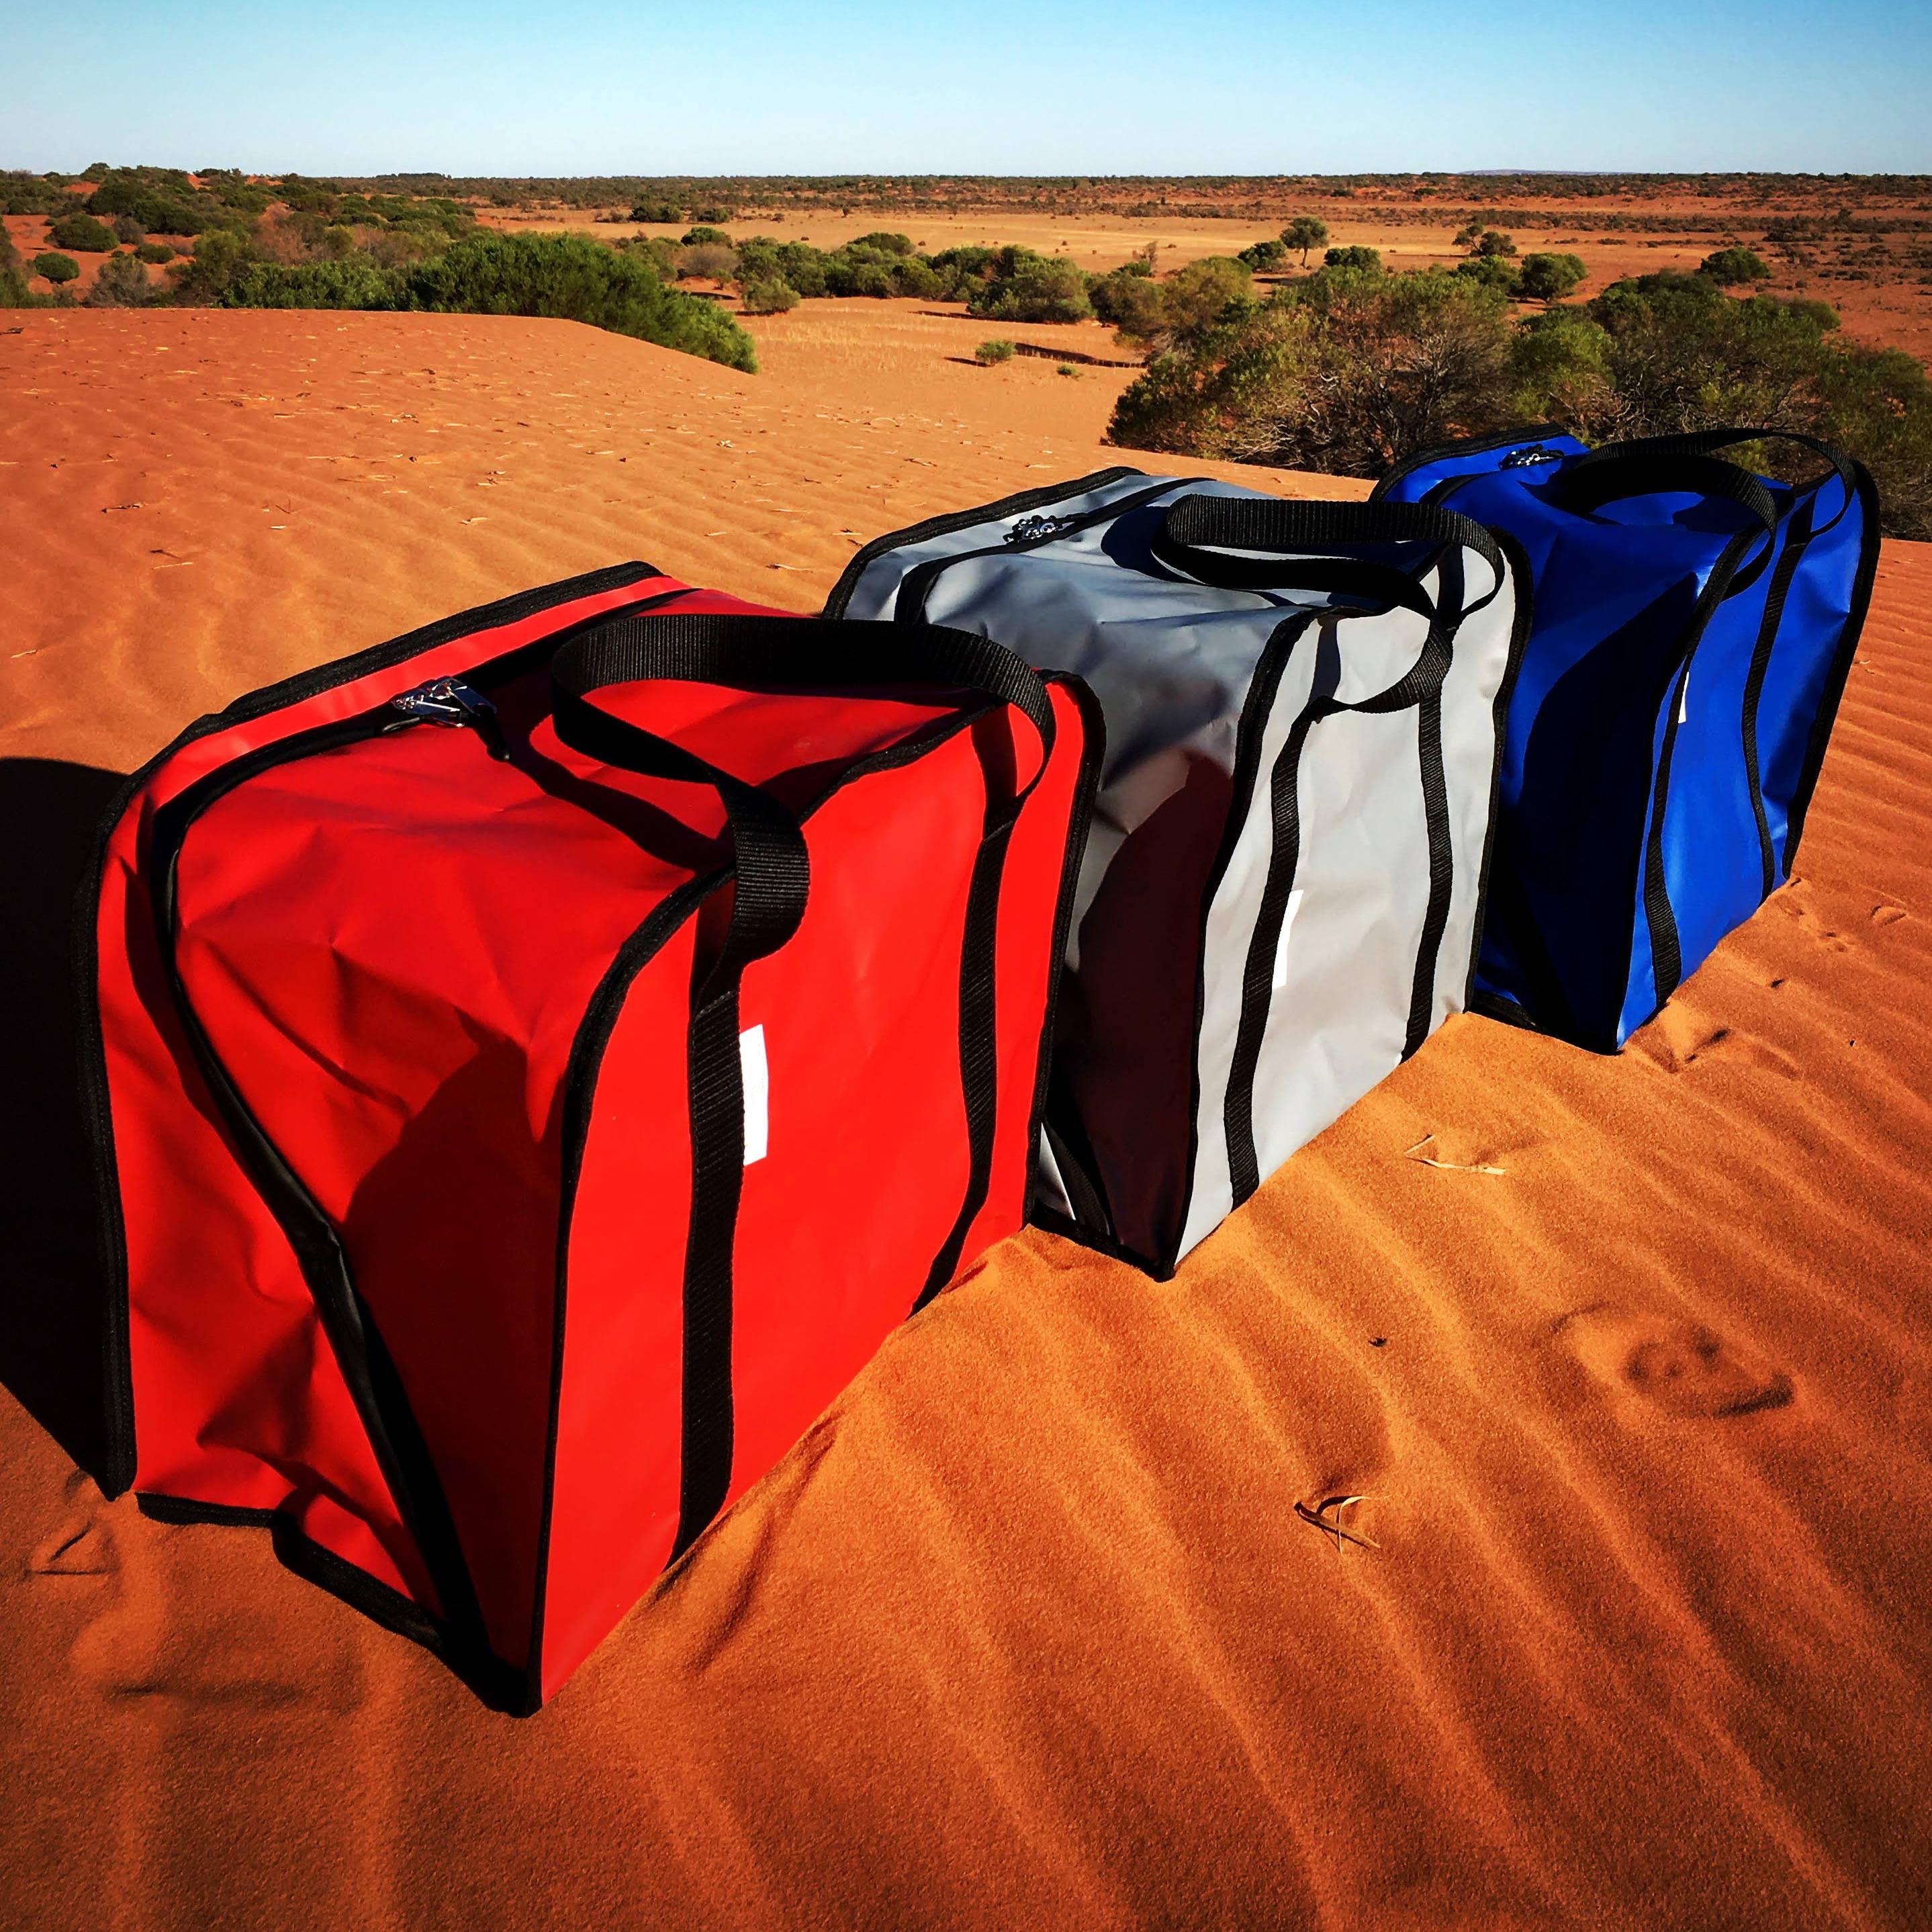 Honda and Yamaha invertor generator carry bags